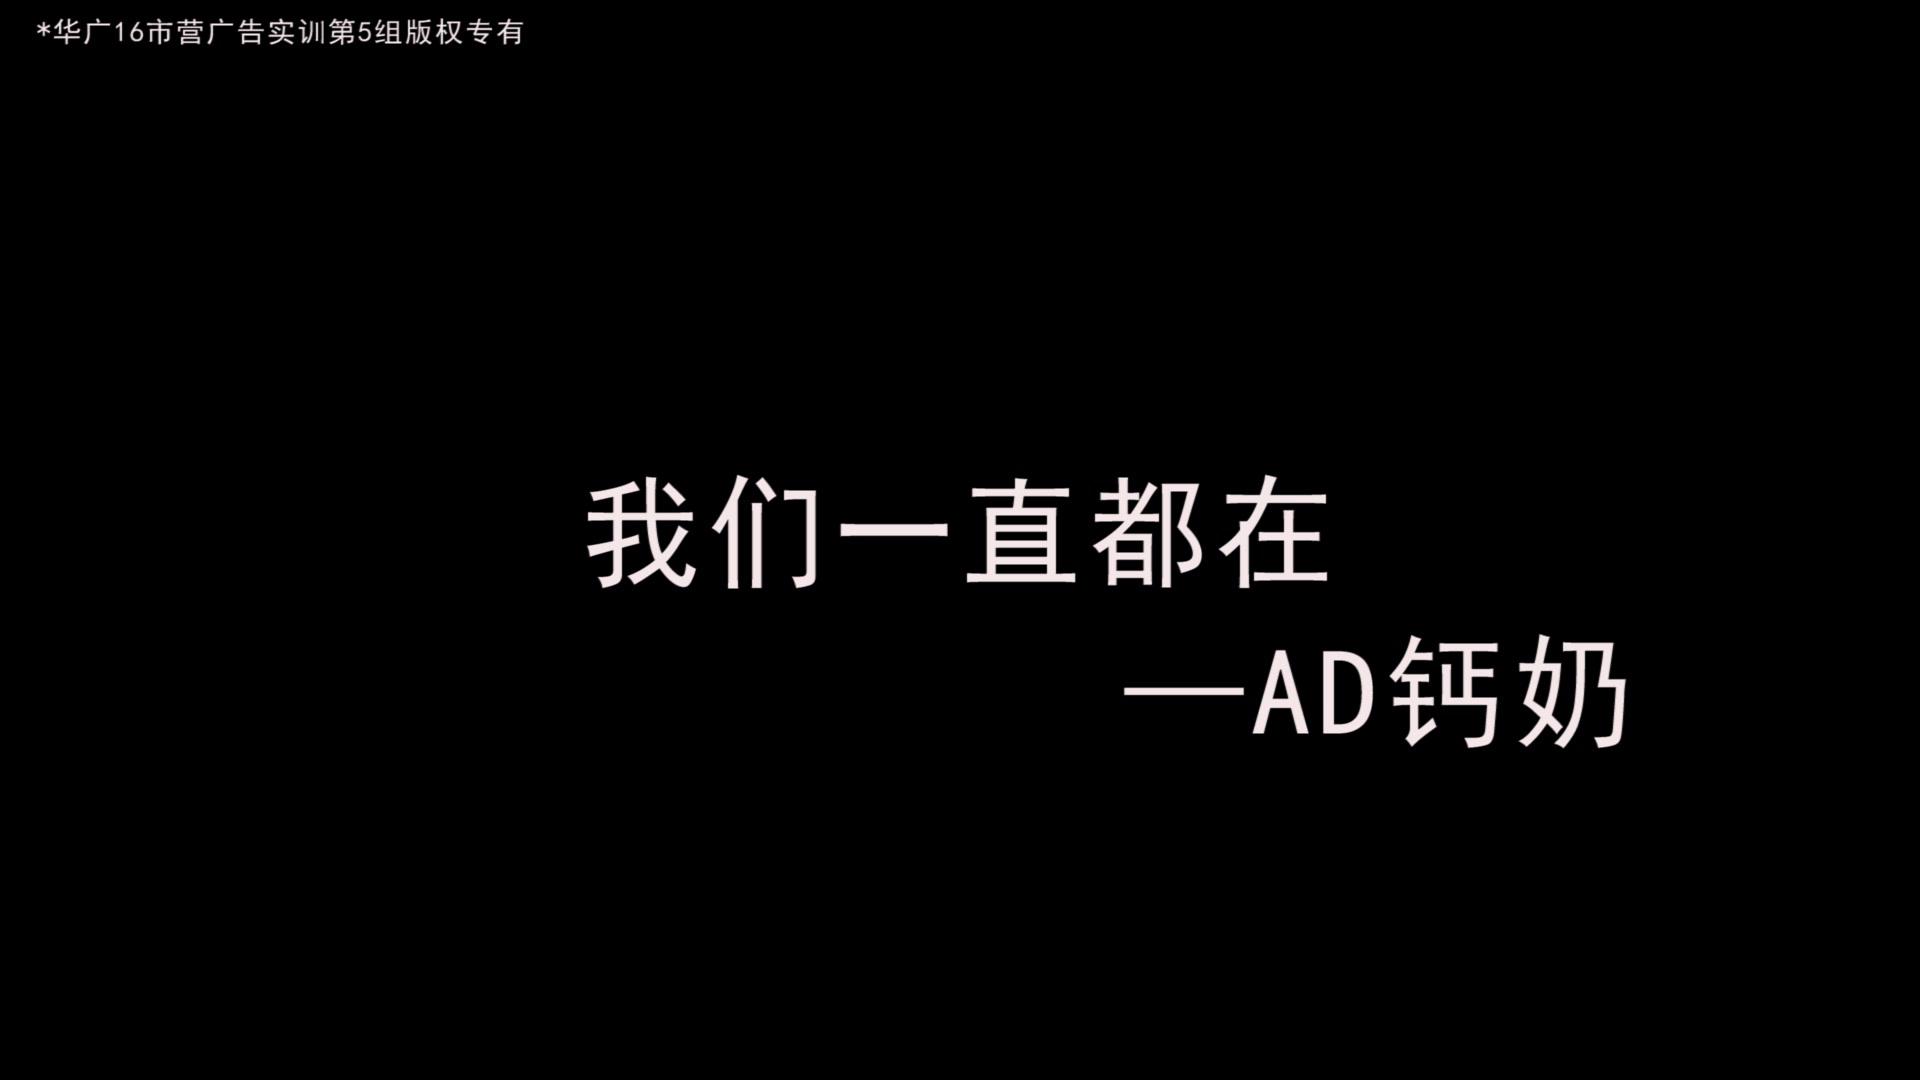 【b鼠】【创意广告】我们一直都在 ——娃哈哈ad钙奶图片